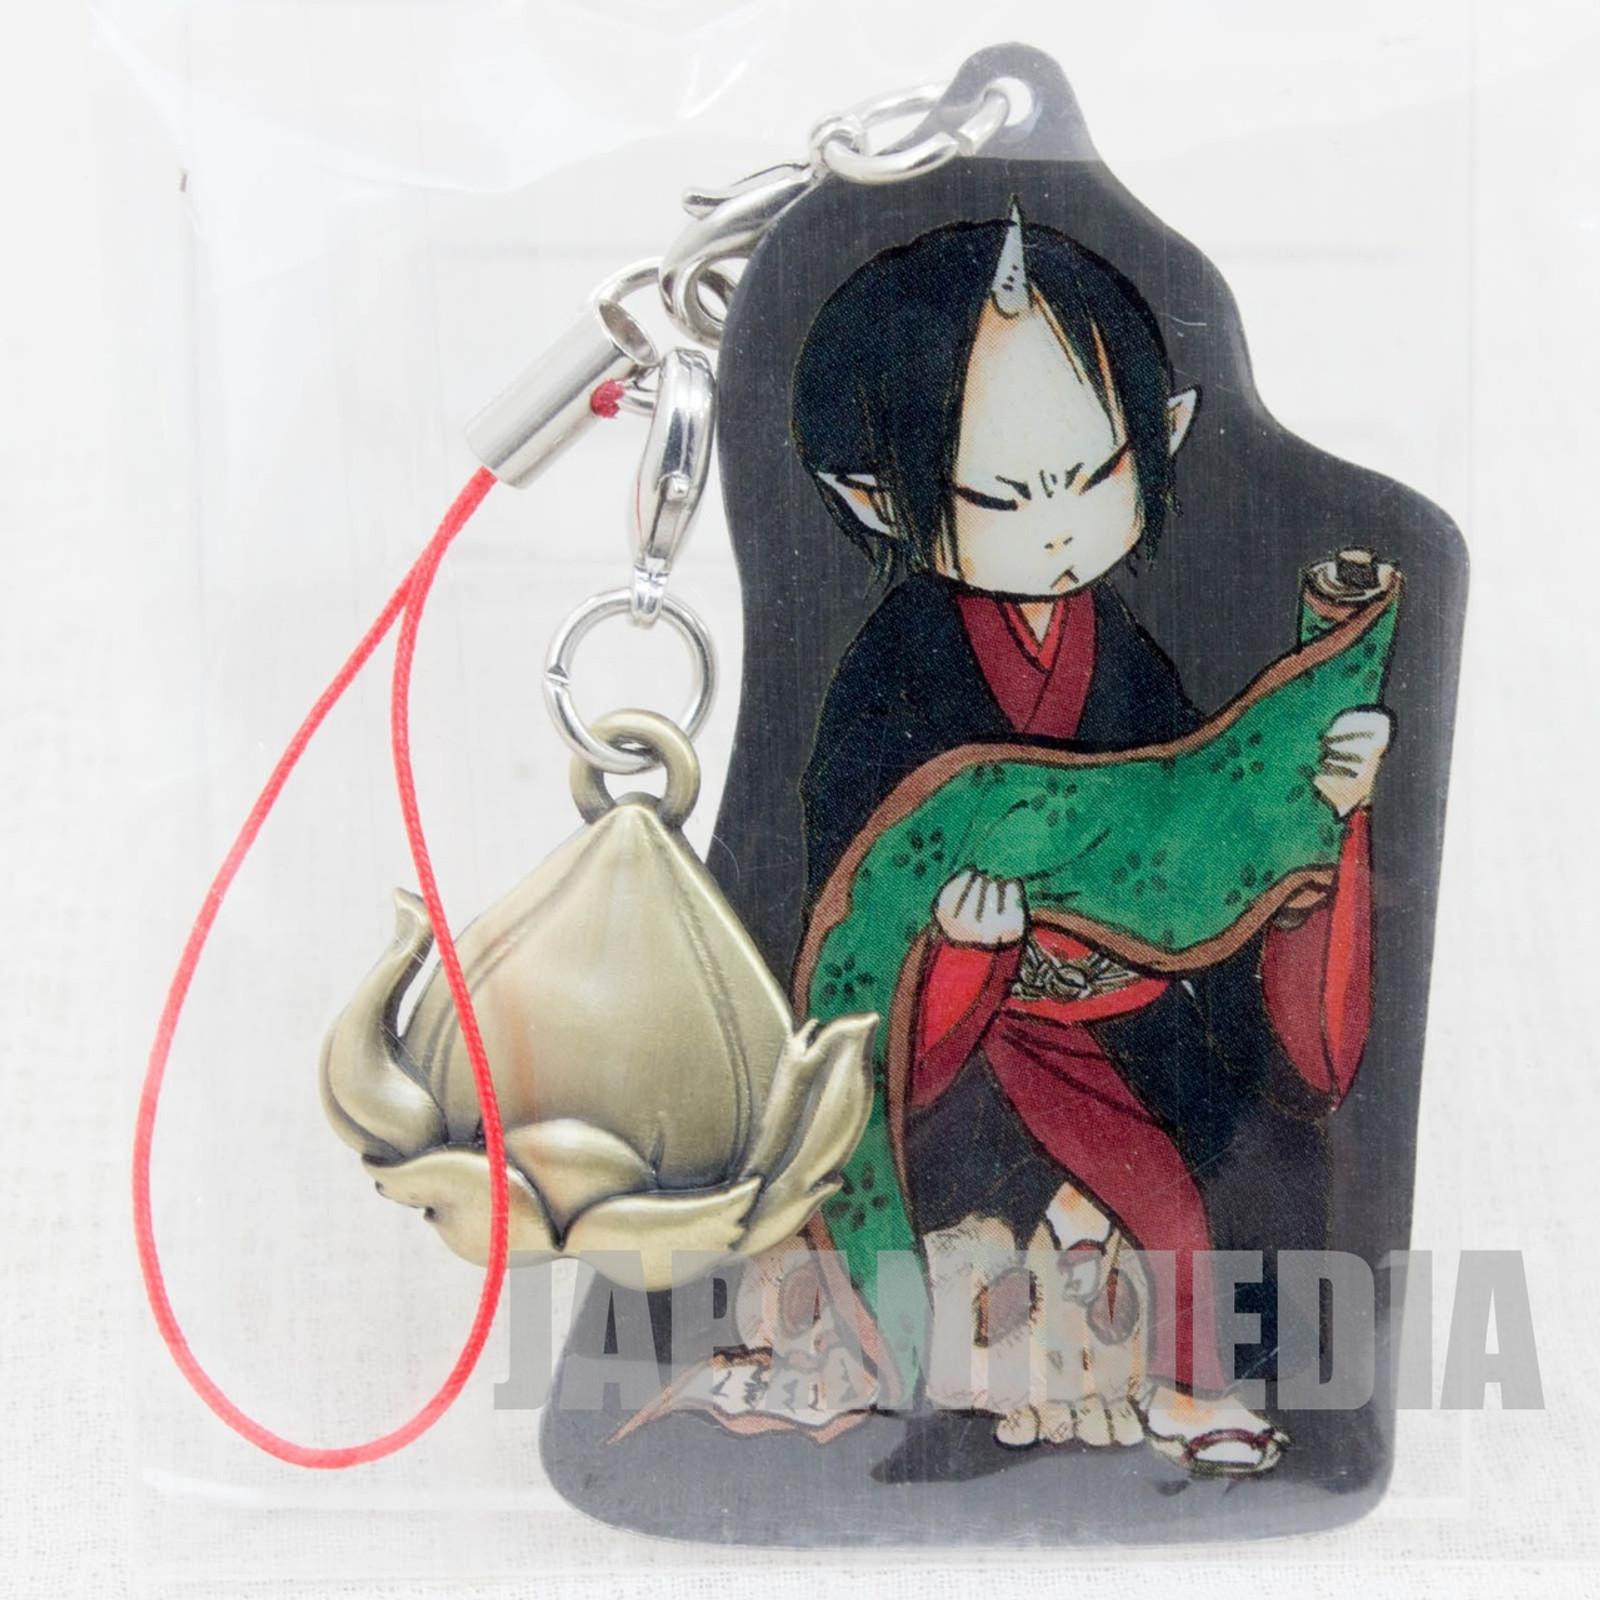 Hozuki no Reitetsu Hozuki Metal Plate Mascot Strap JAPAN ANIME MANGA